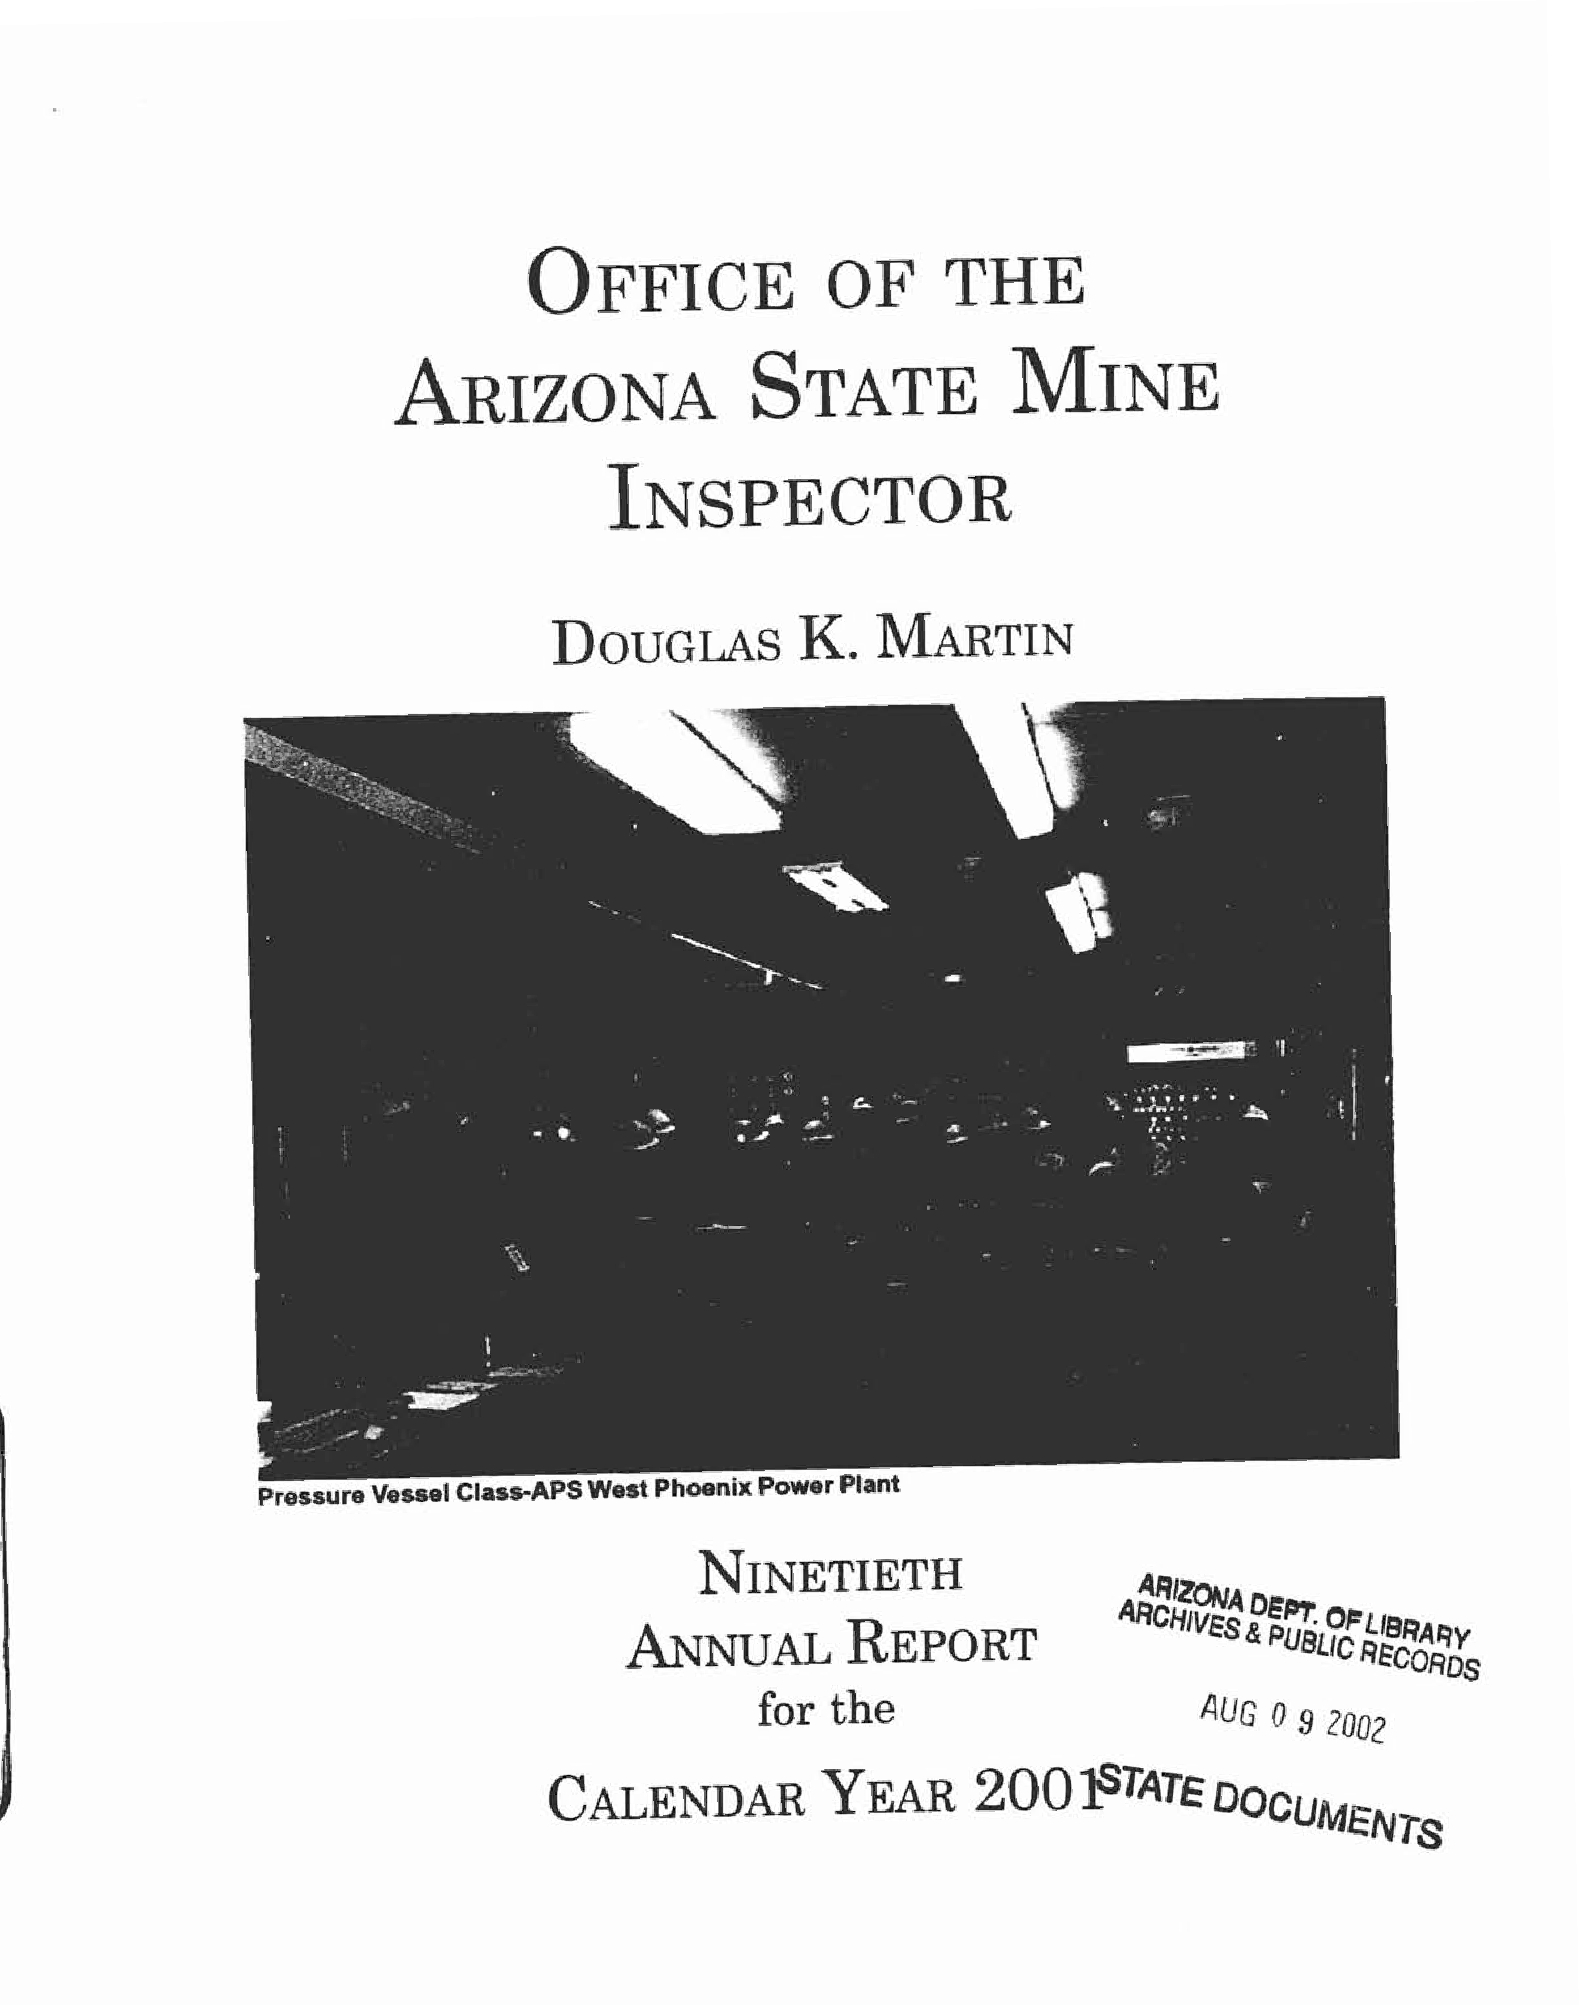 Ninetieth Annual Report For The Calendar Year 2001 - Arizona